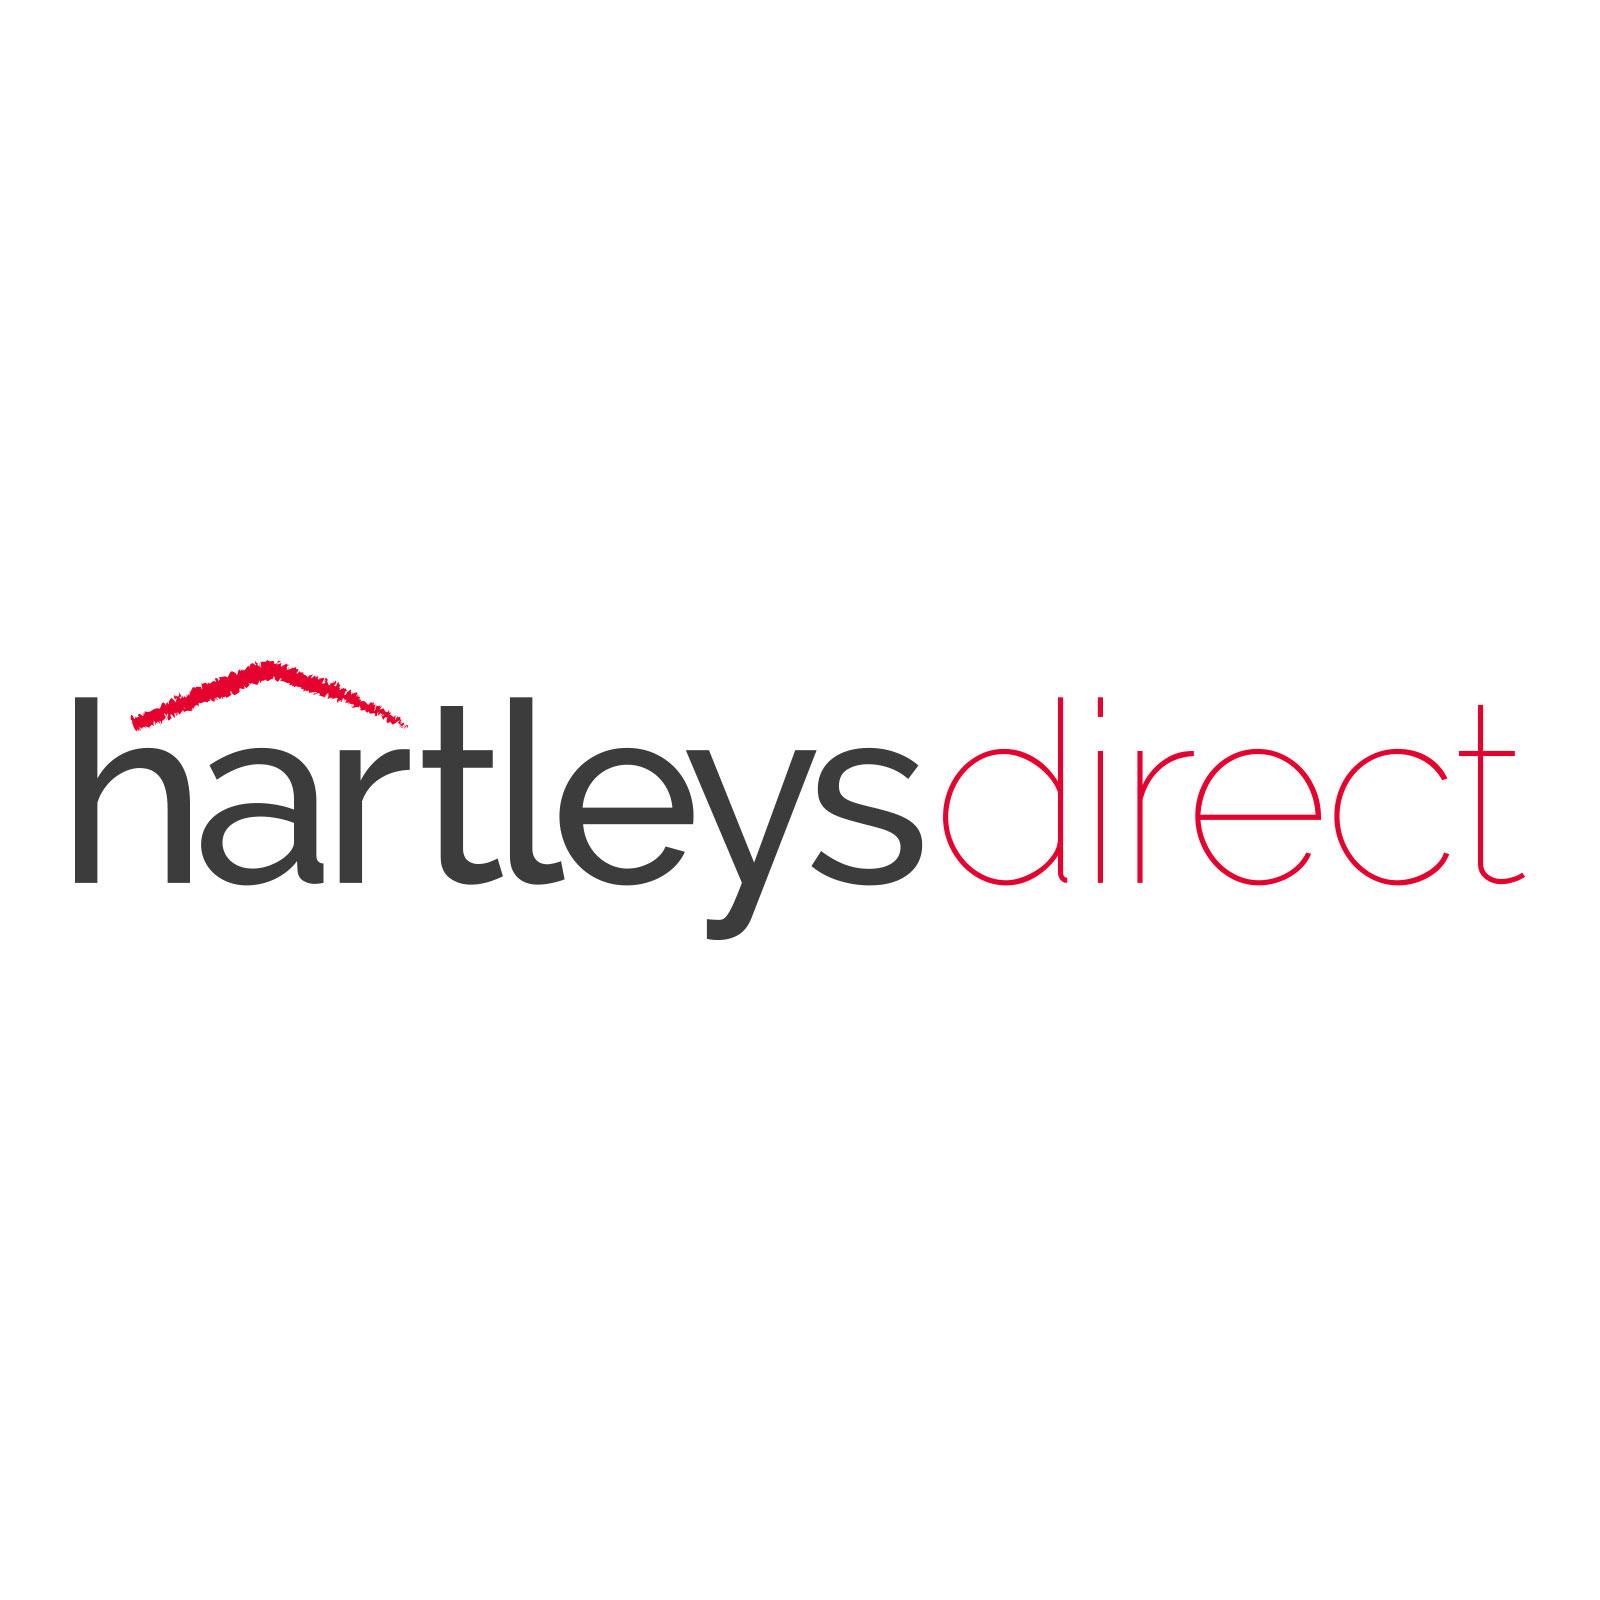 Hartleys-Aluminium-Office-Chair-Base-and-Castor-Wheels-on-White-Background.jpg